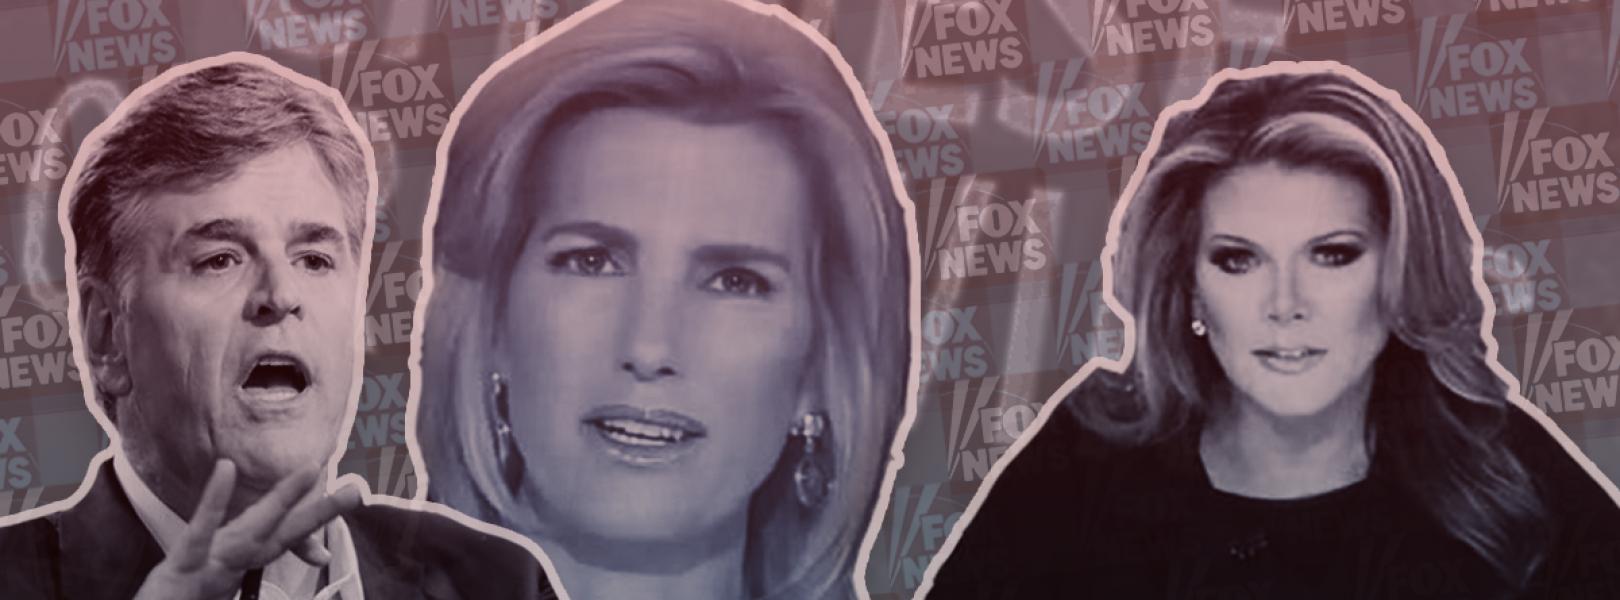 Sean Hannity, Laura Ingraham, and Trish Regan